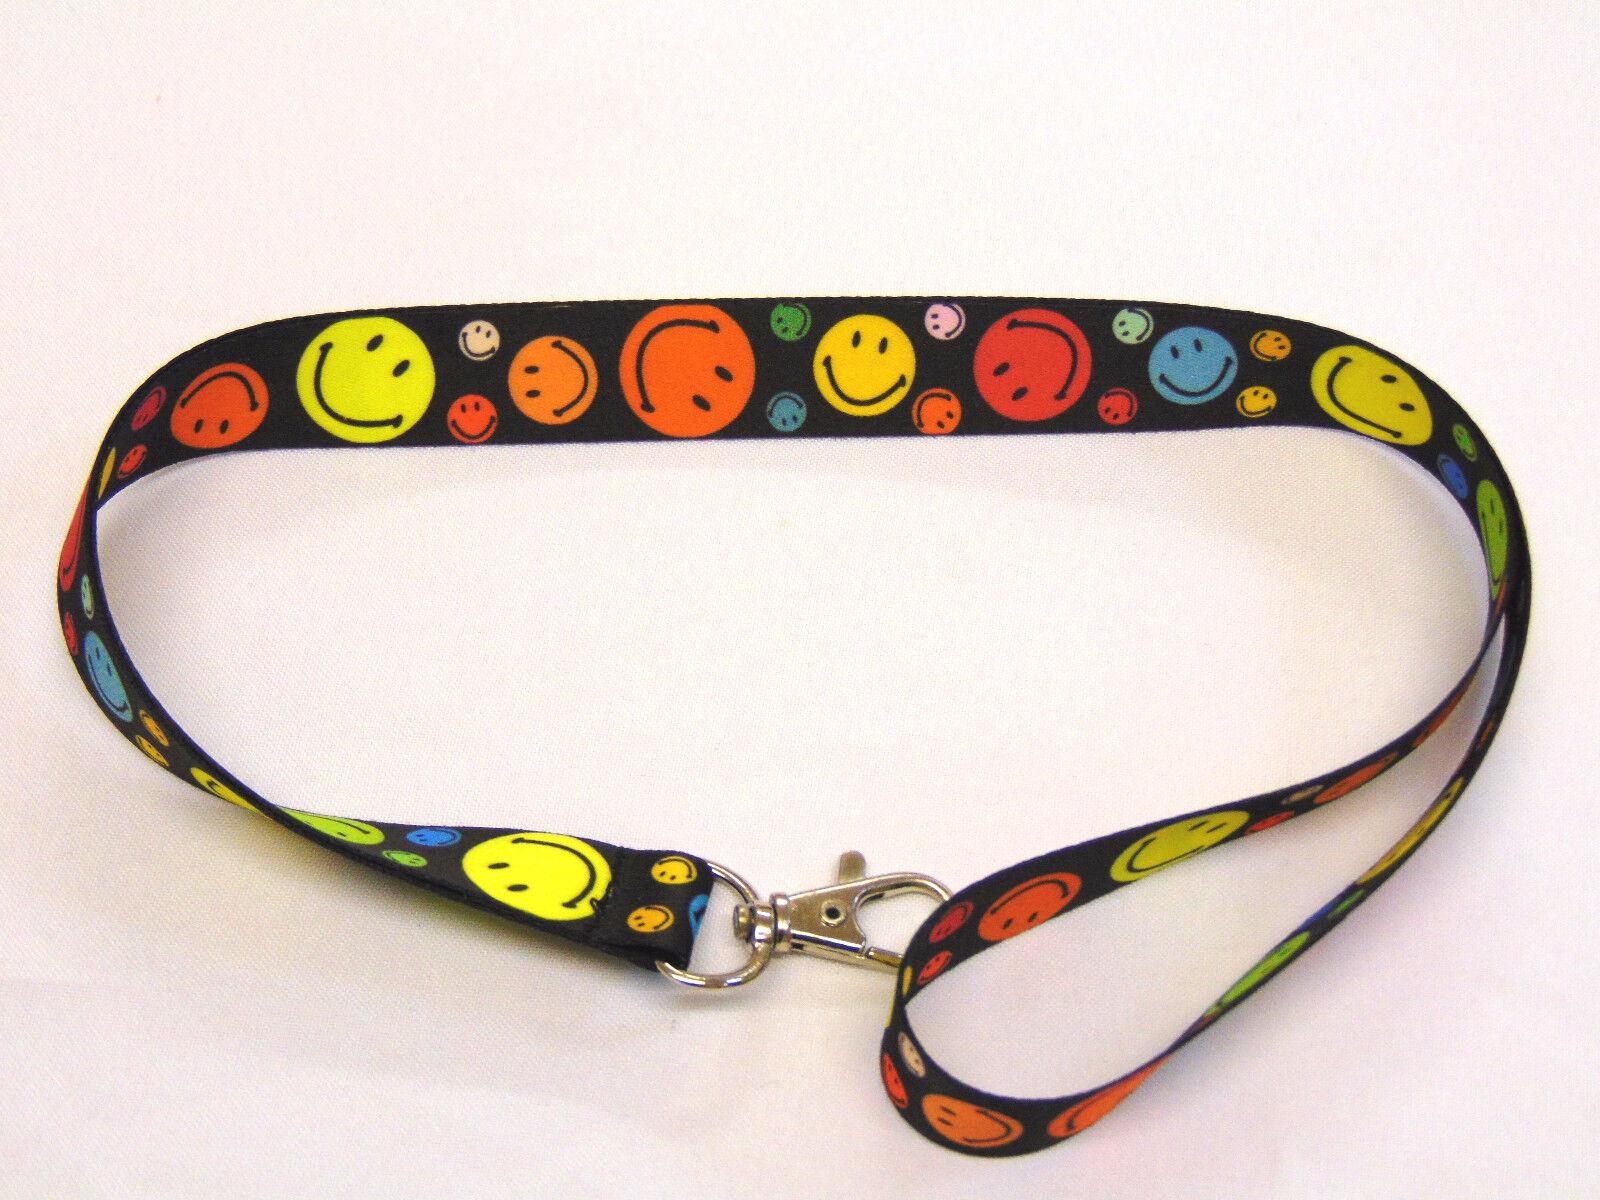 6 printed neck strap lanyards Smiley, Cartoon, Police Line, AD-HD - ID keys etc